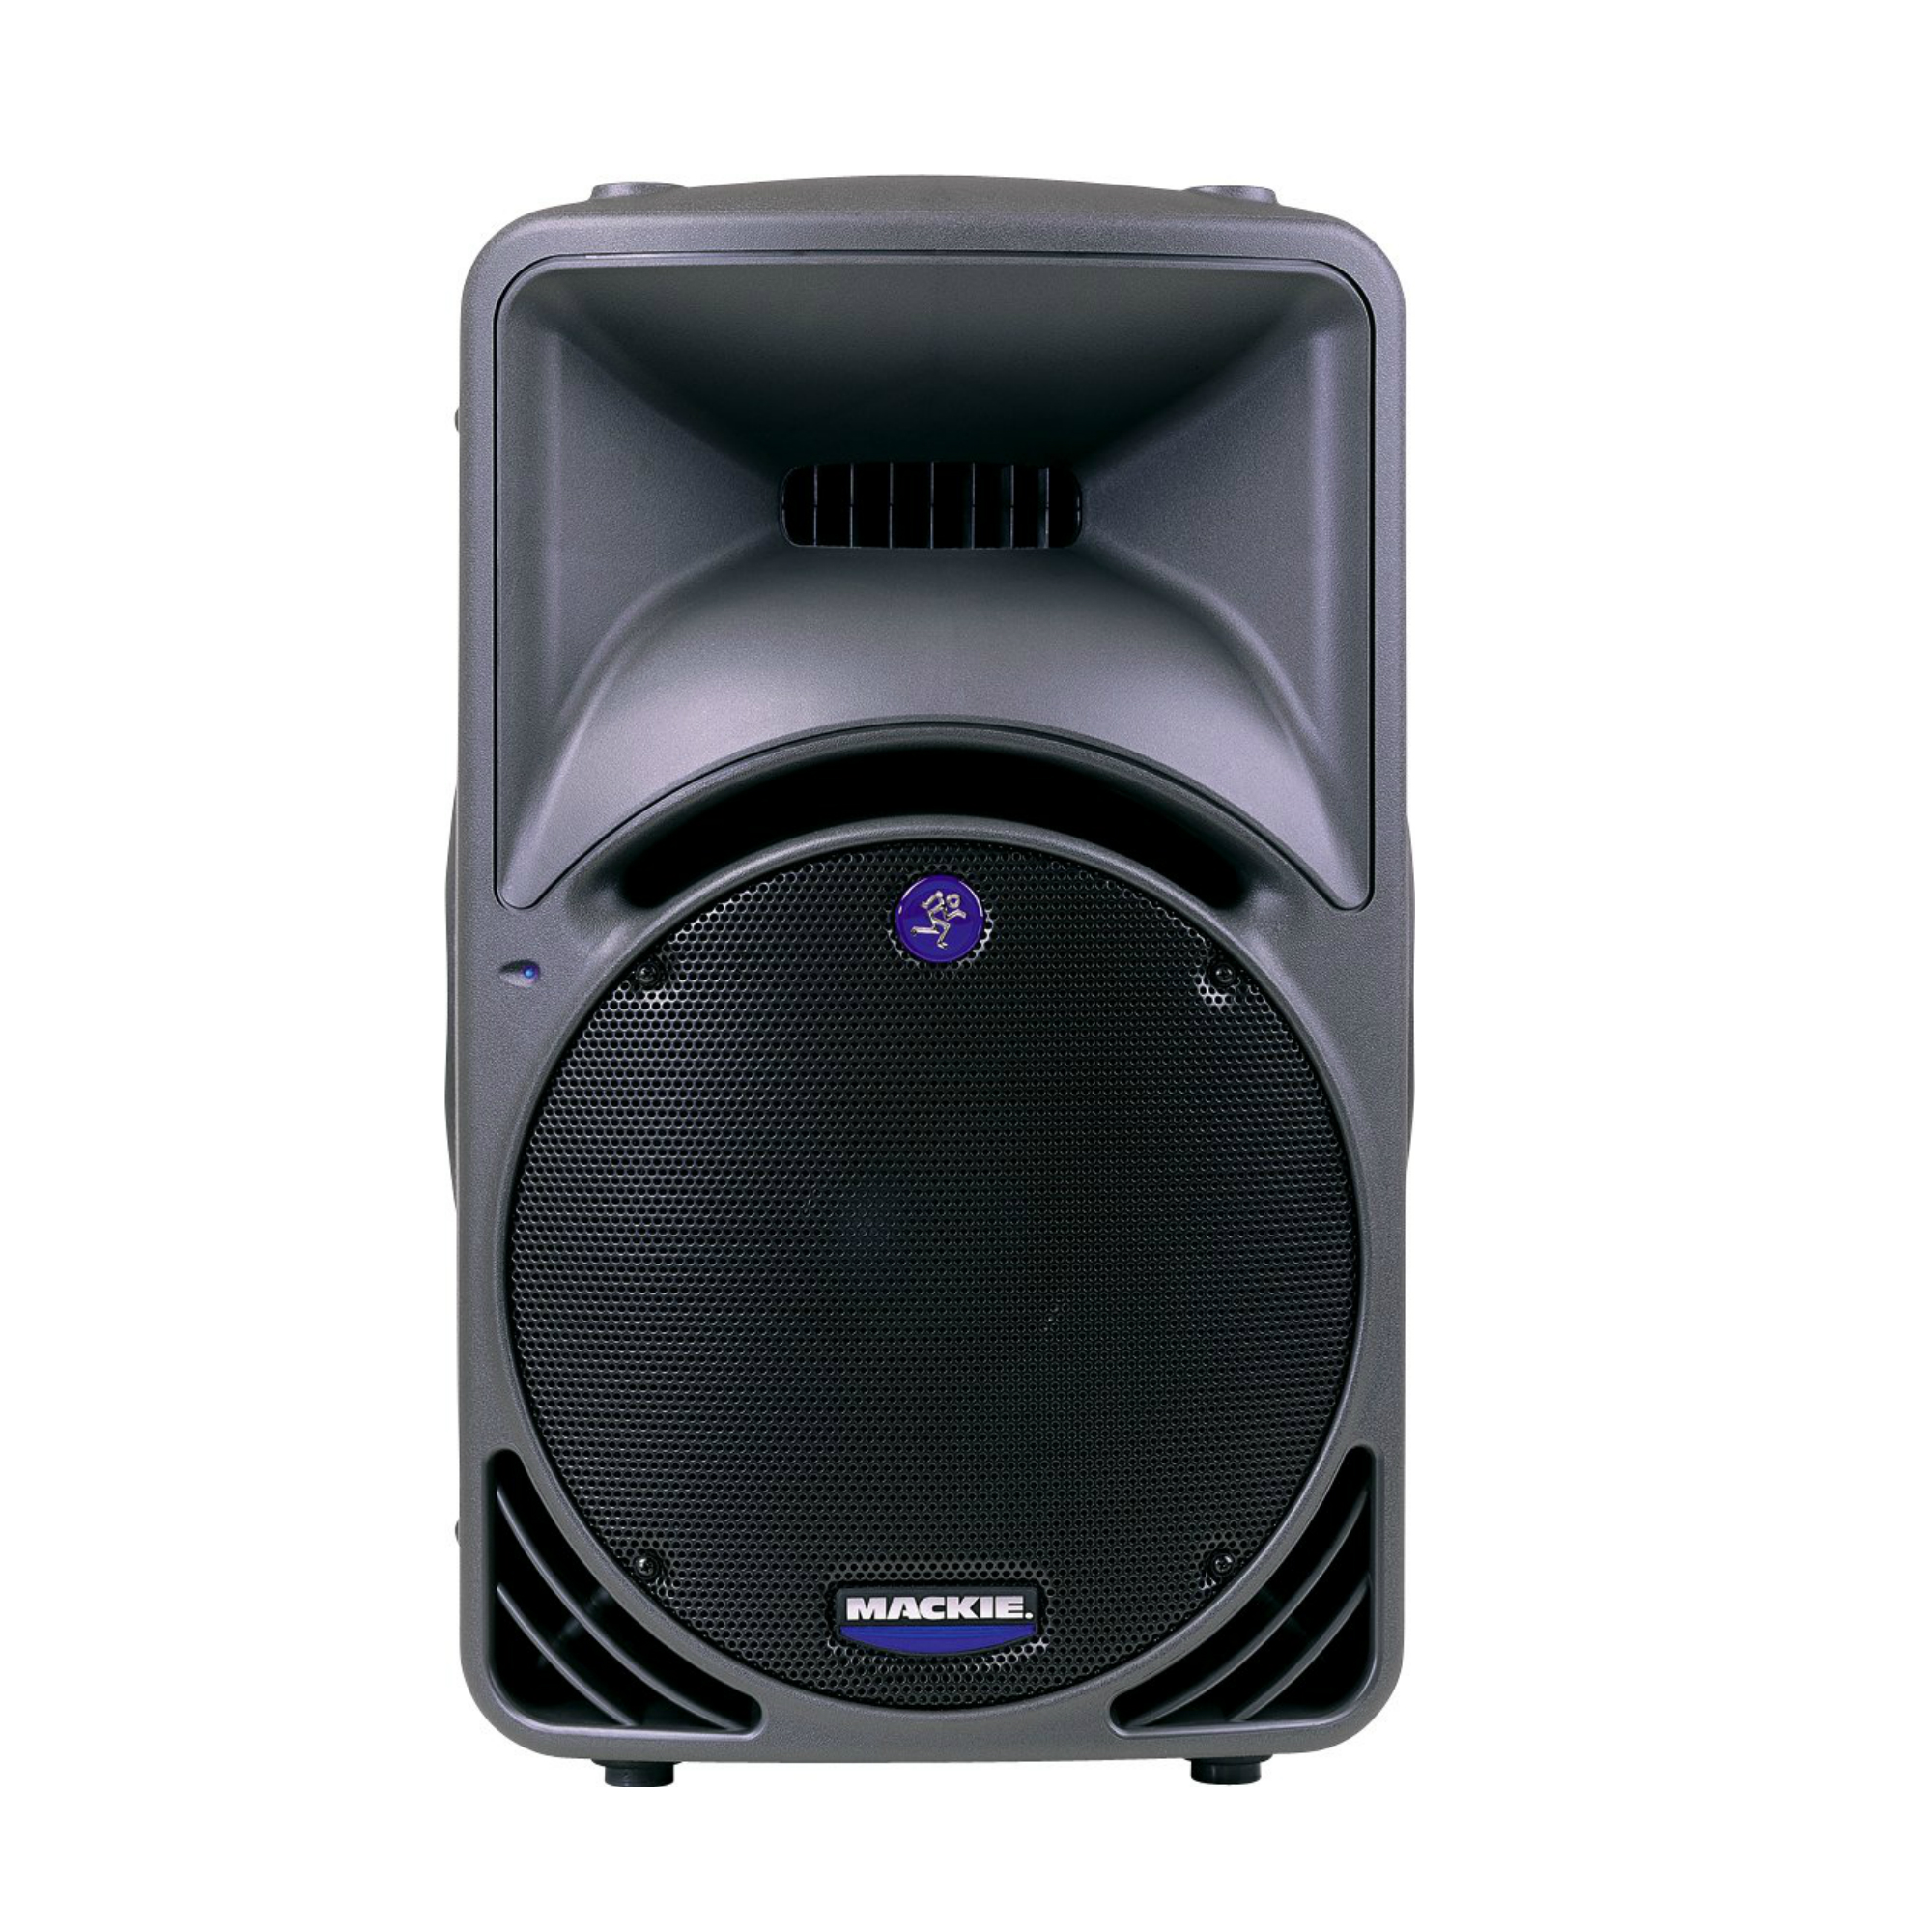 mackie srm450 12 inch powered speaker rental dj peoples. Black Bedroom Furniture Sets. Home Design Ideas